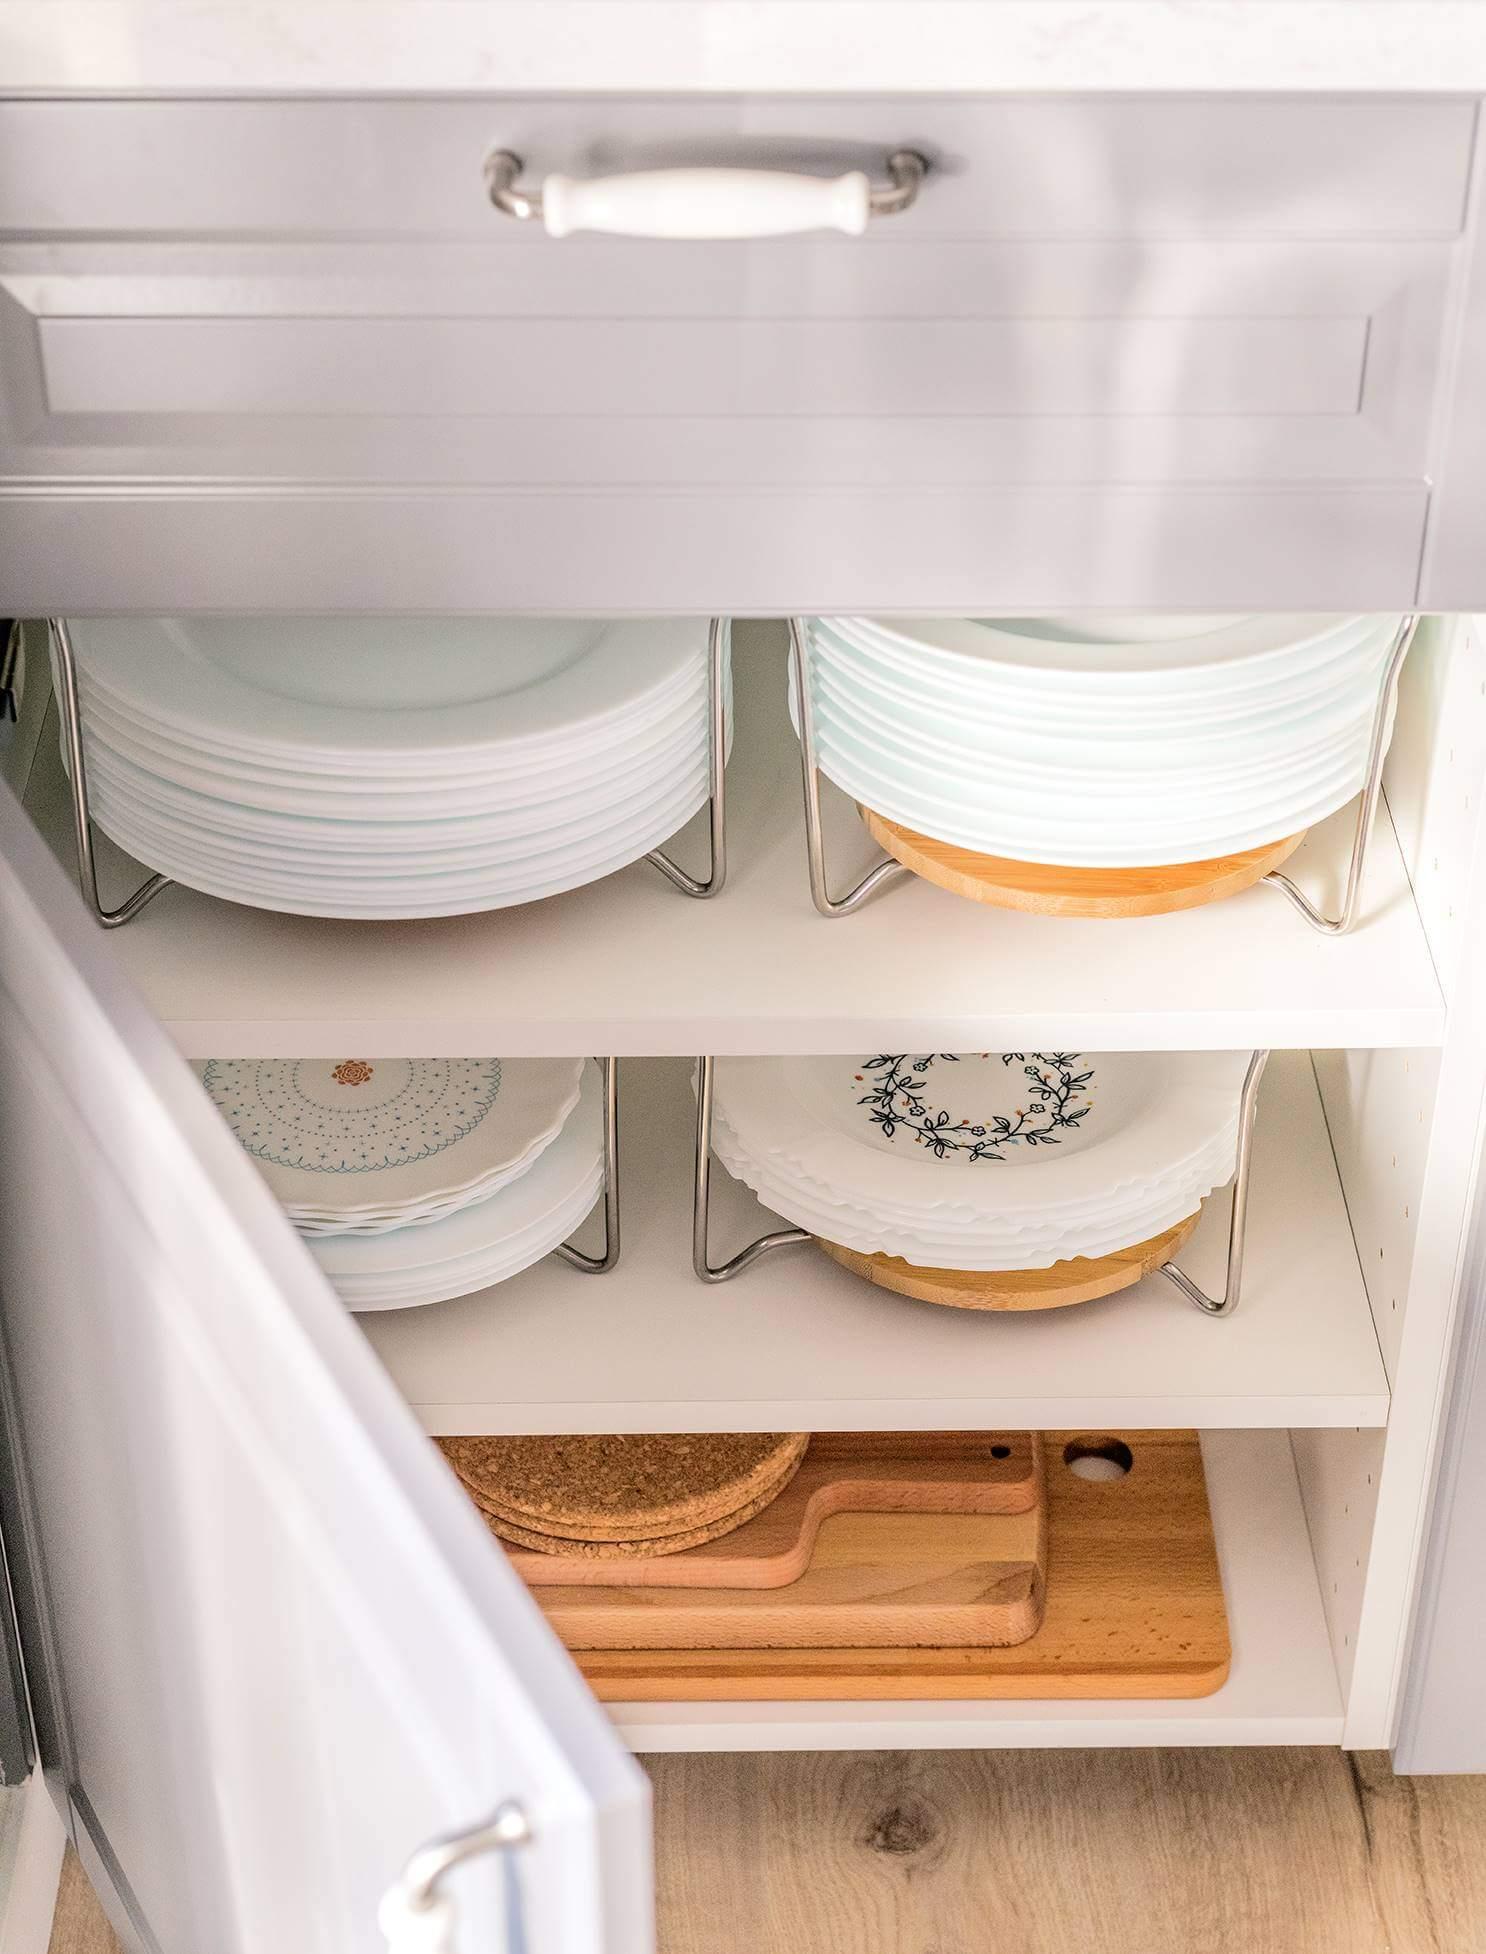 Организация хранения посуды на кухне